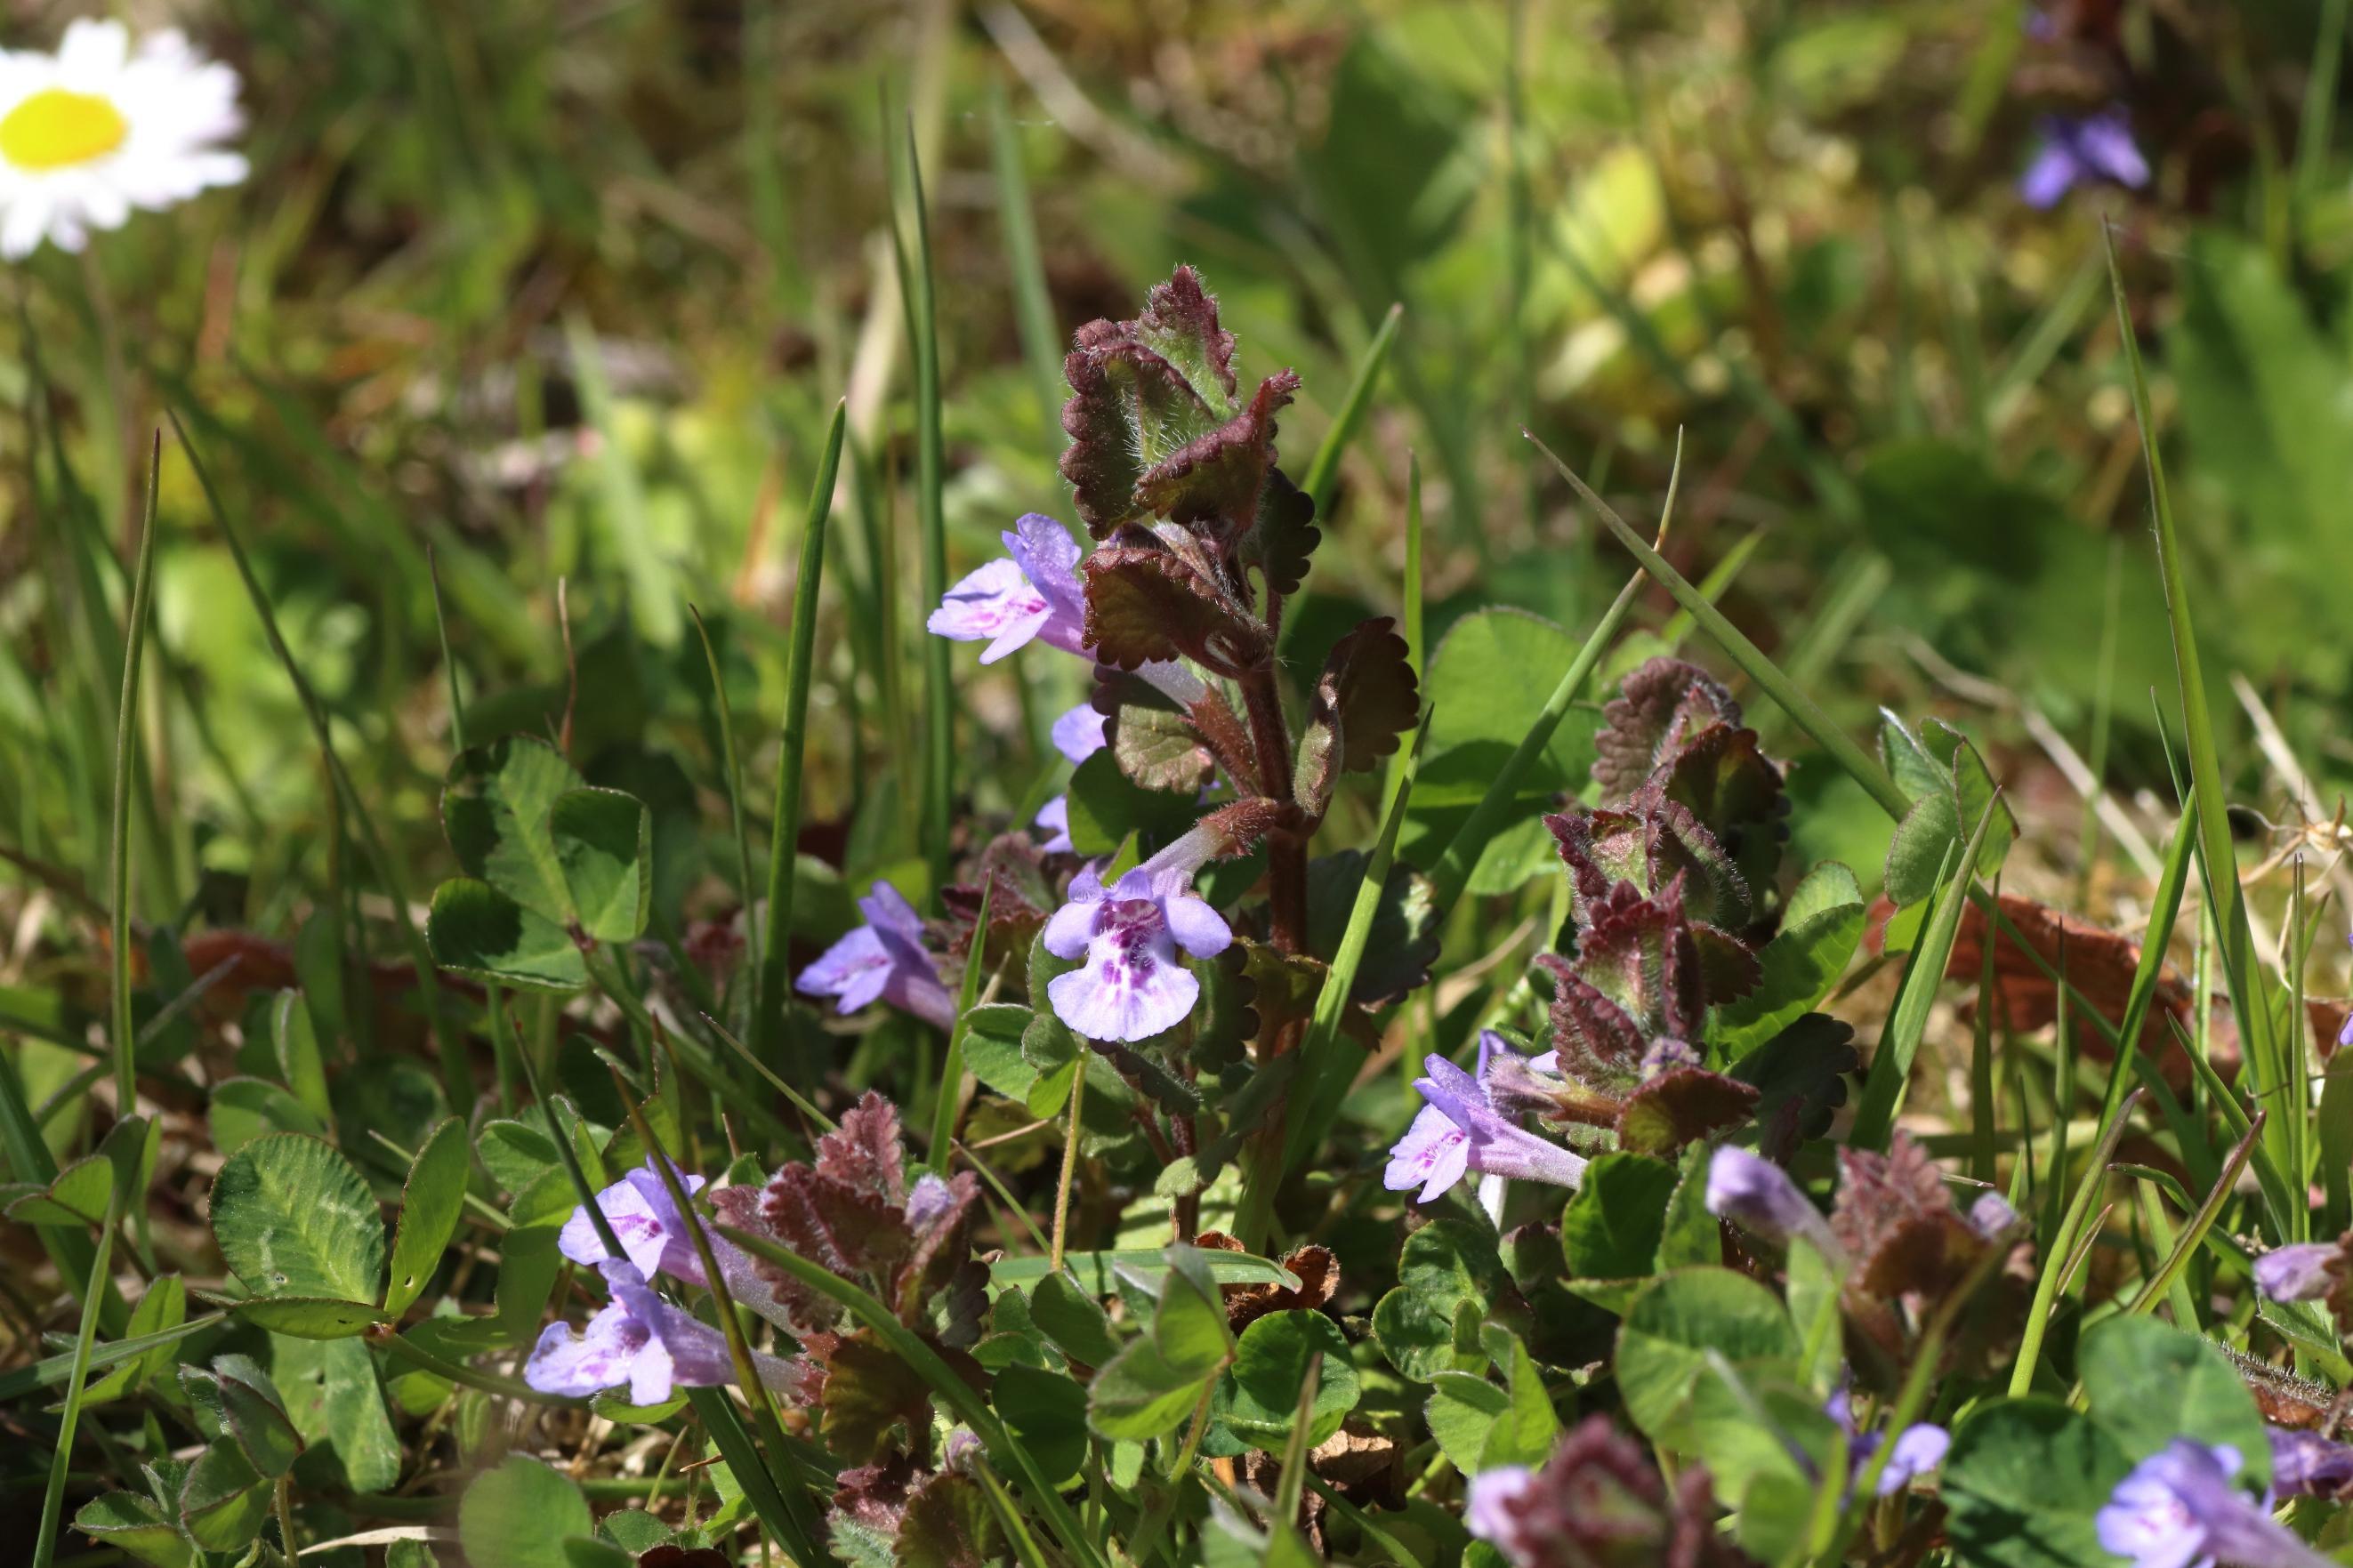 Gundermann - Blütenstand